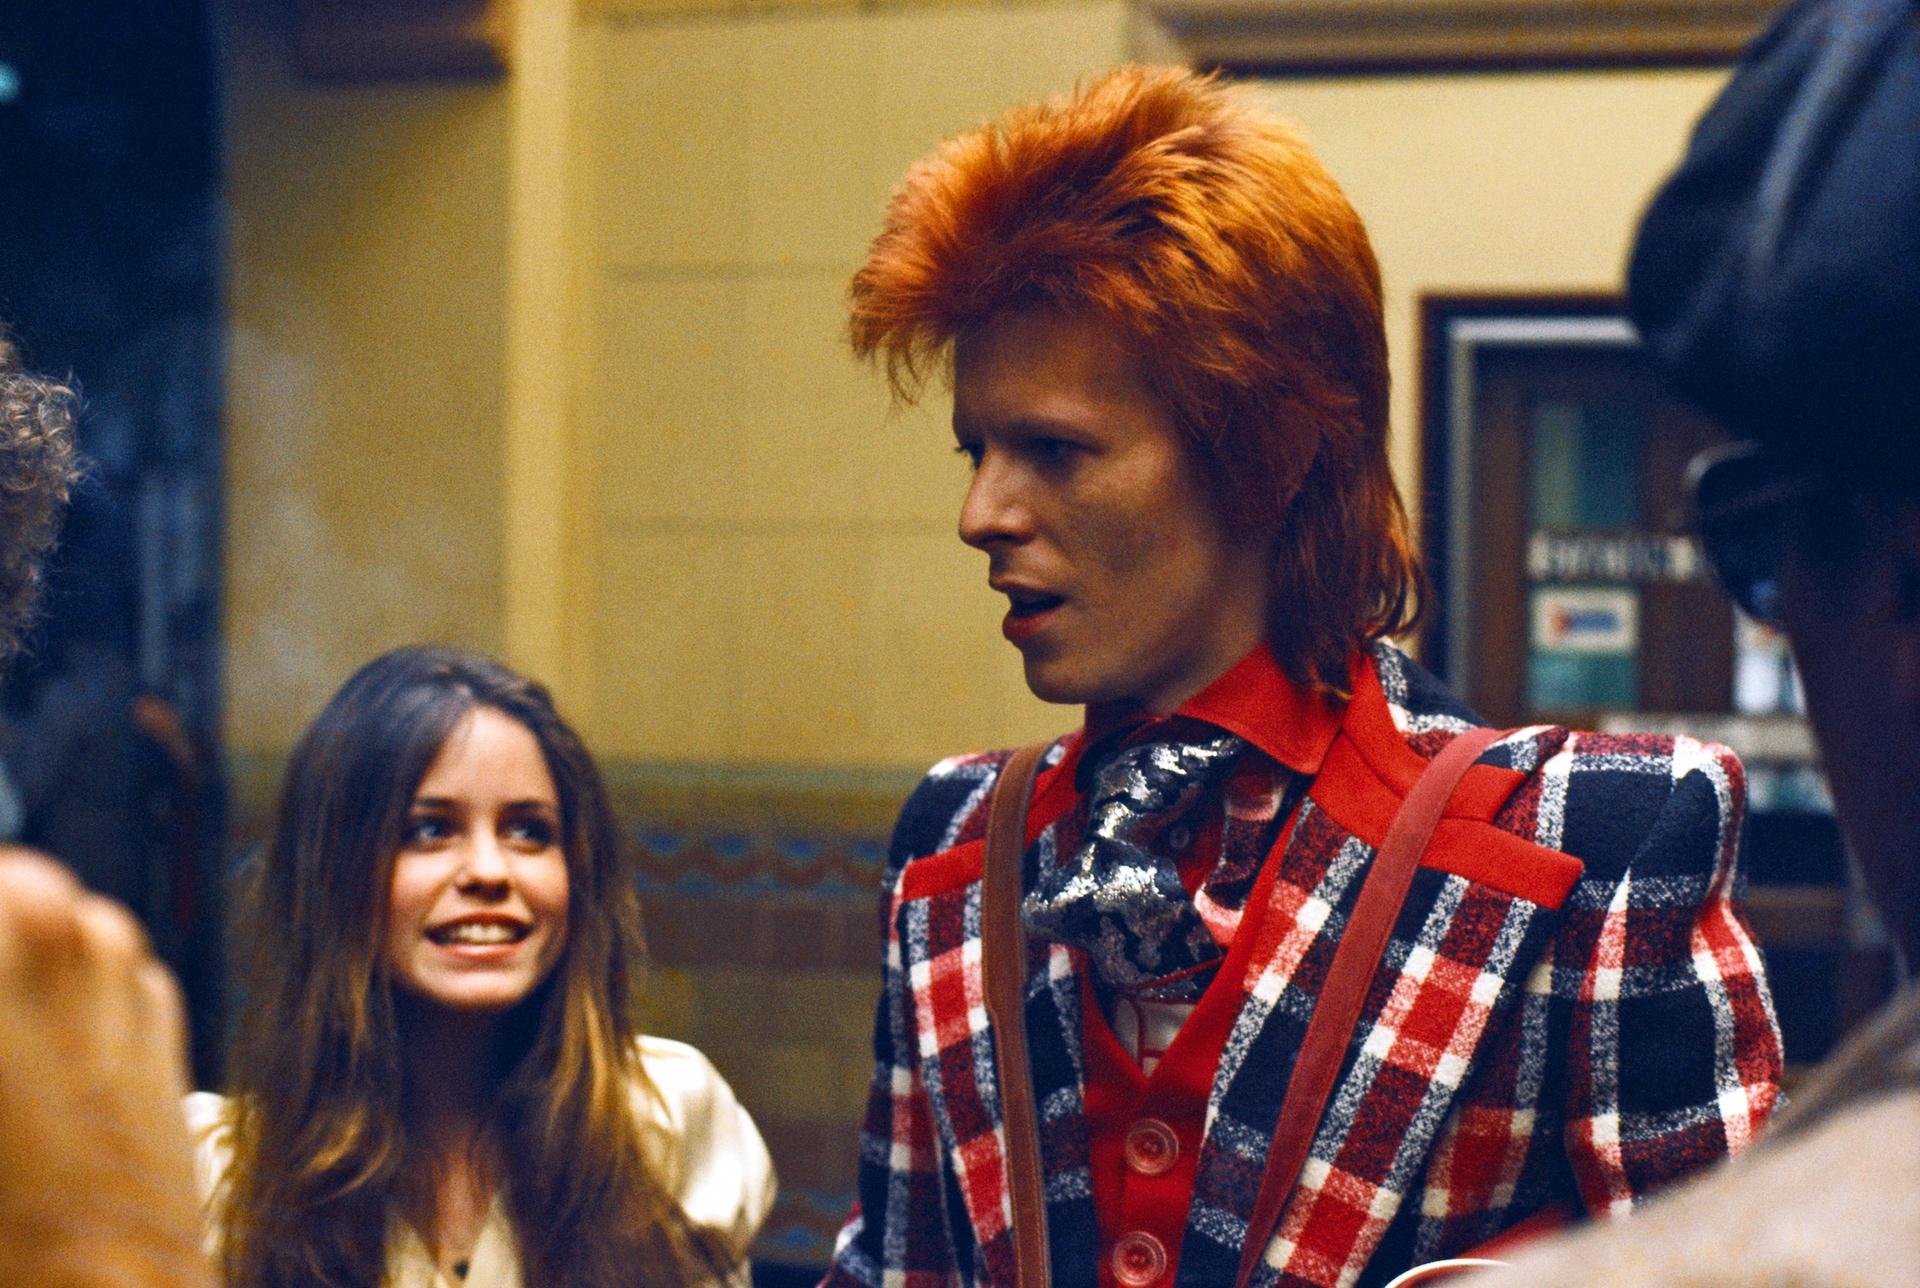 Дейвид Бауи с почитателка през 1973 г. в Лос Анджелис Снимка: Michael Ochs / Corbis